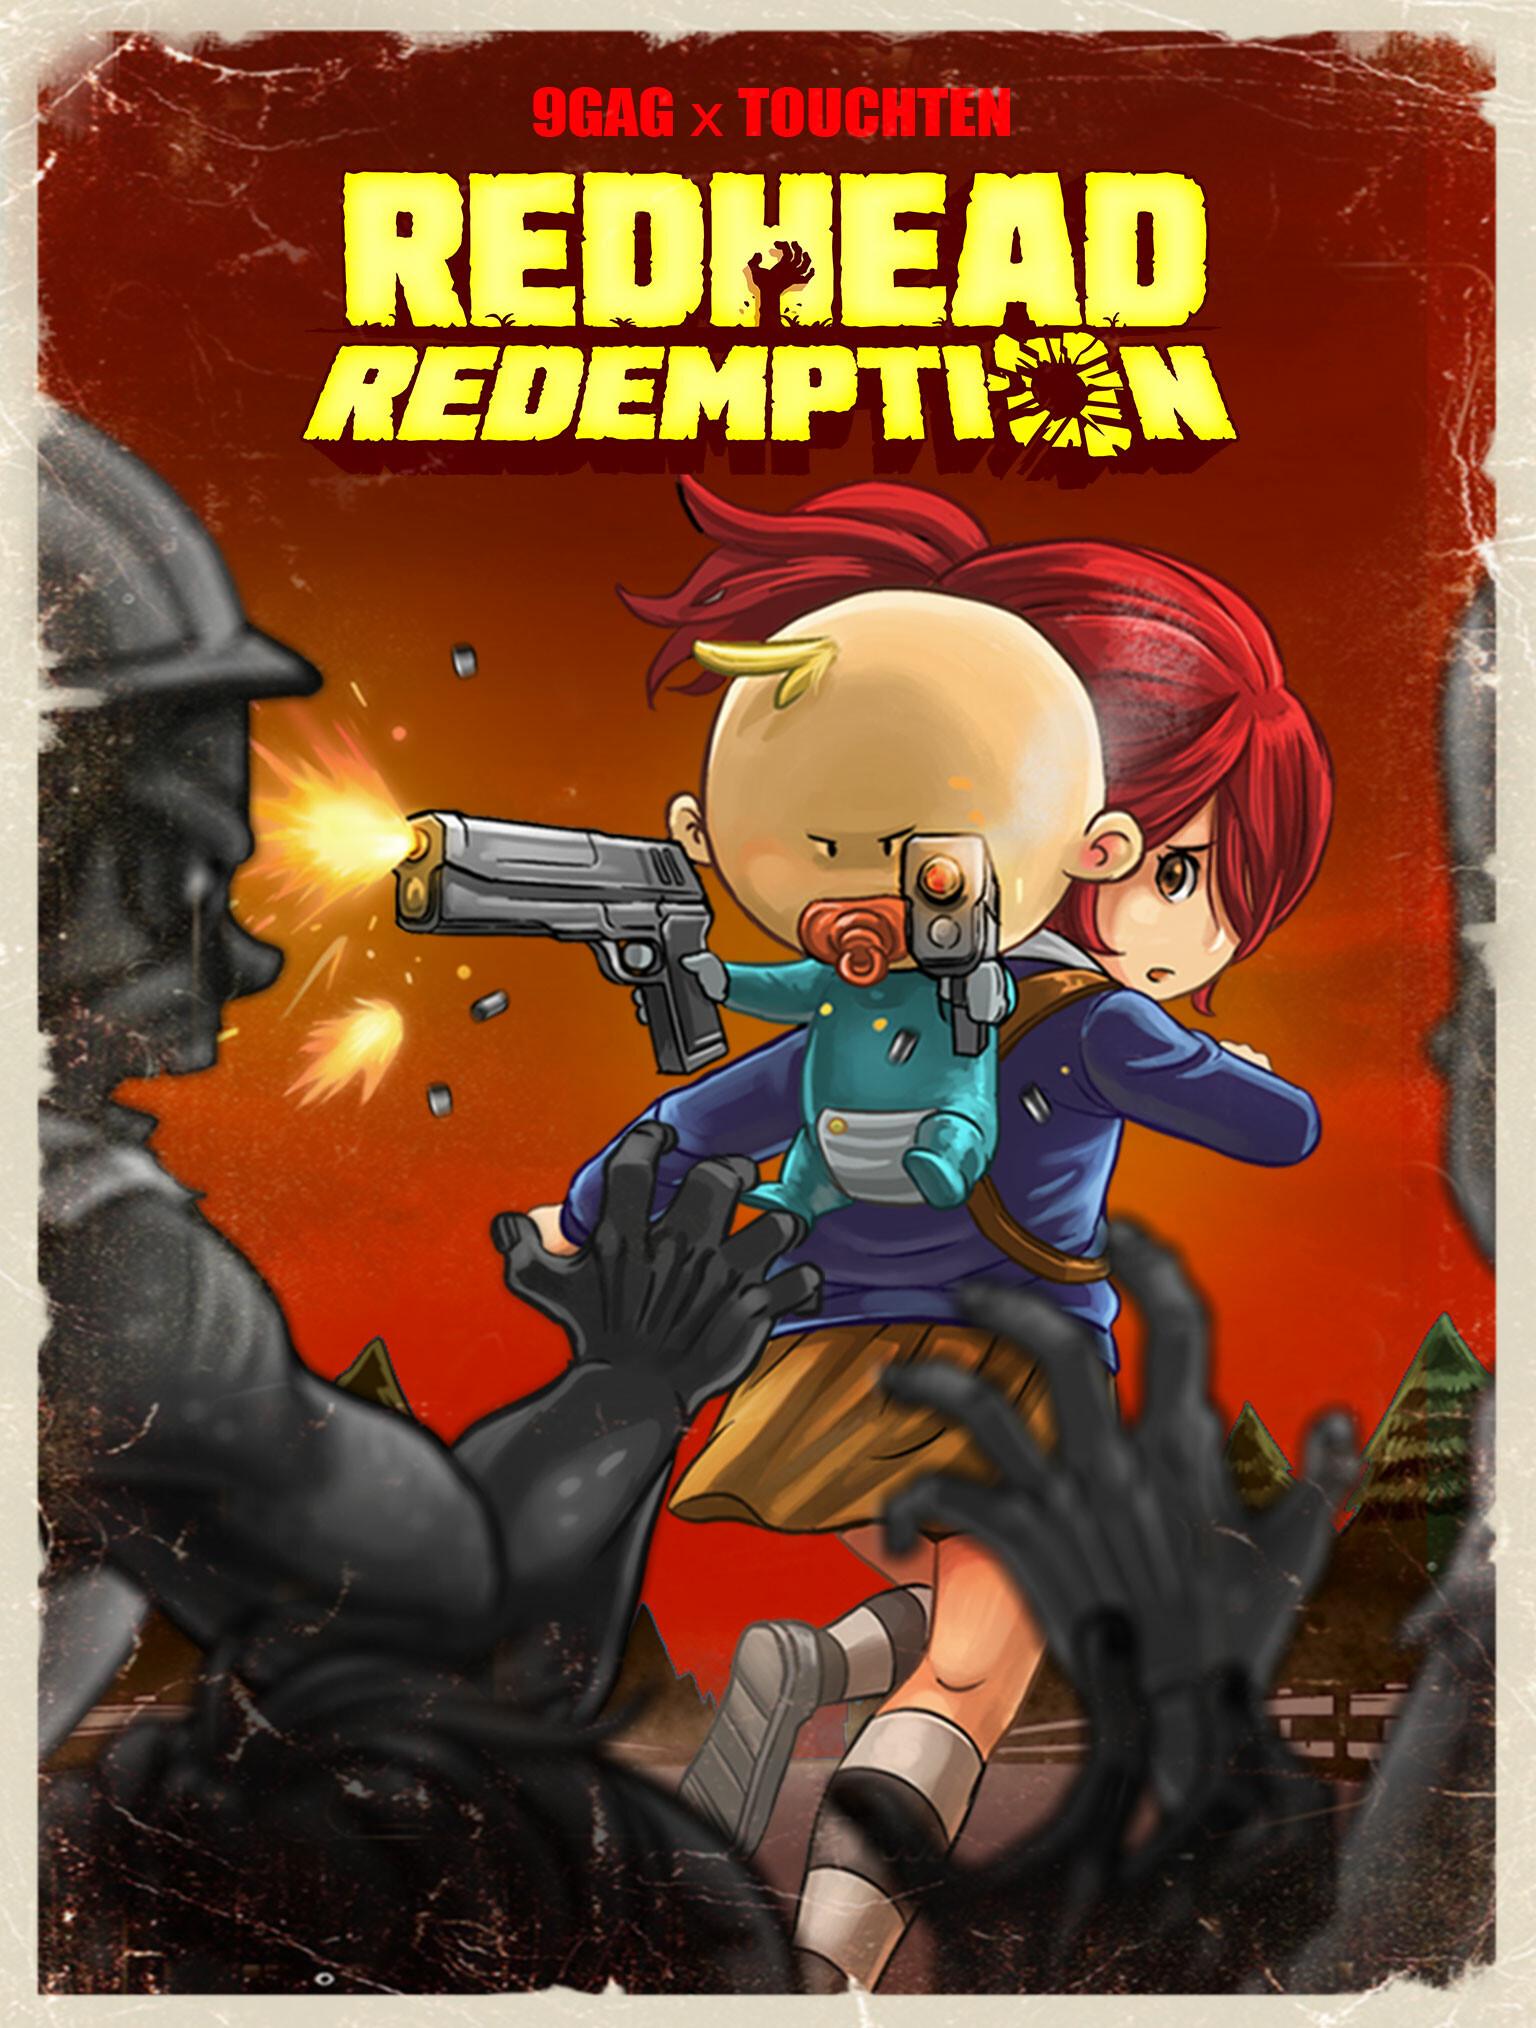 ArtStation - RedHead Redemption, Nilwafa Praduta